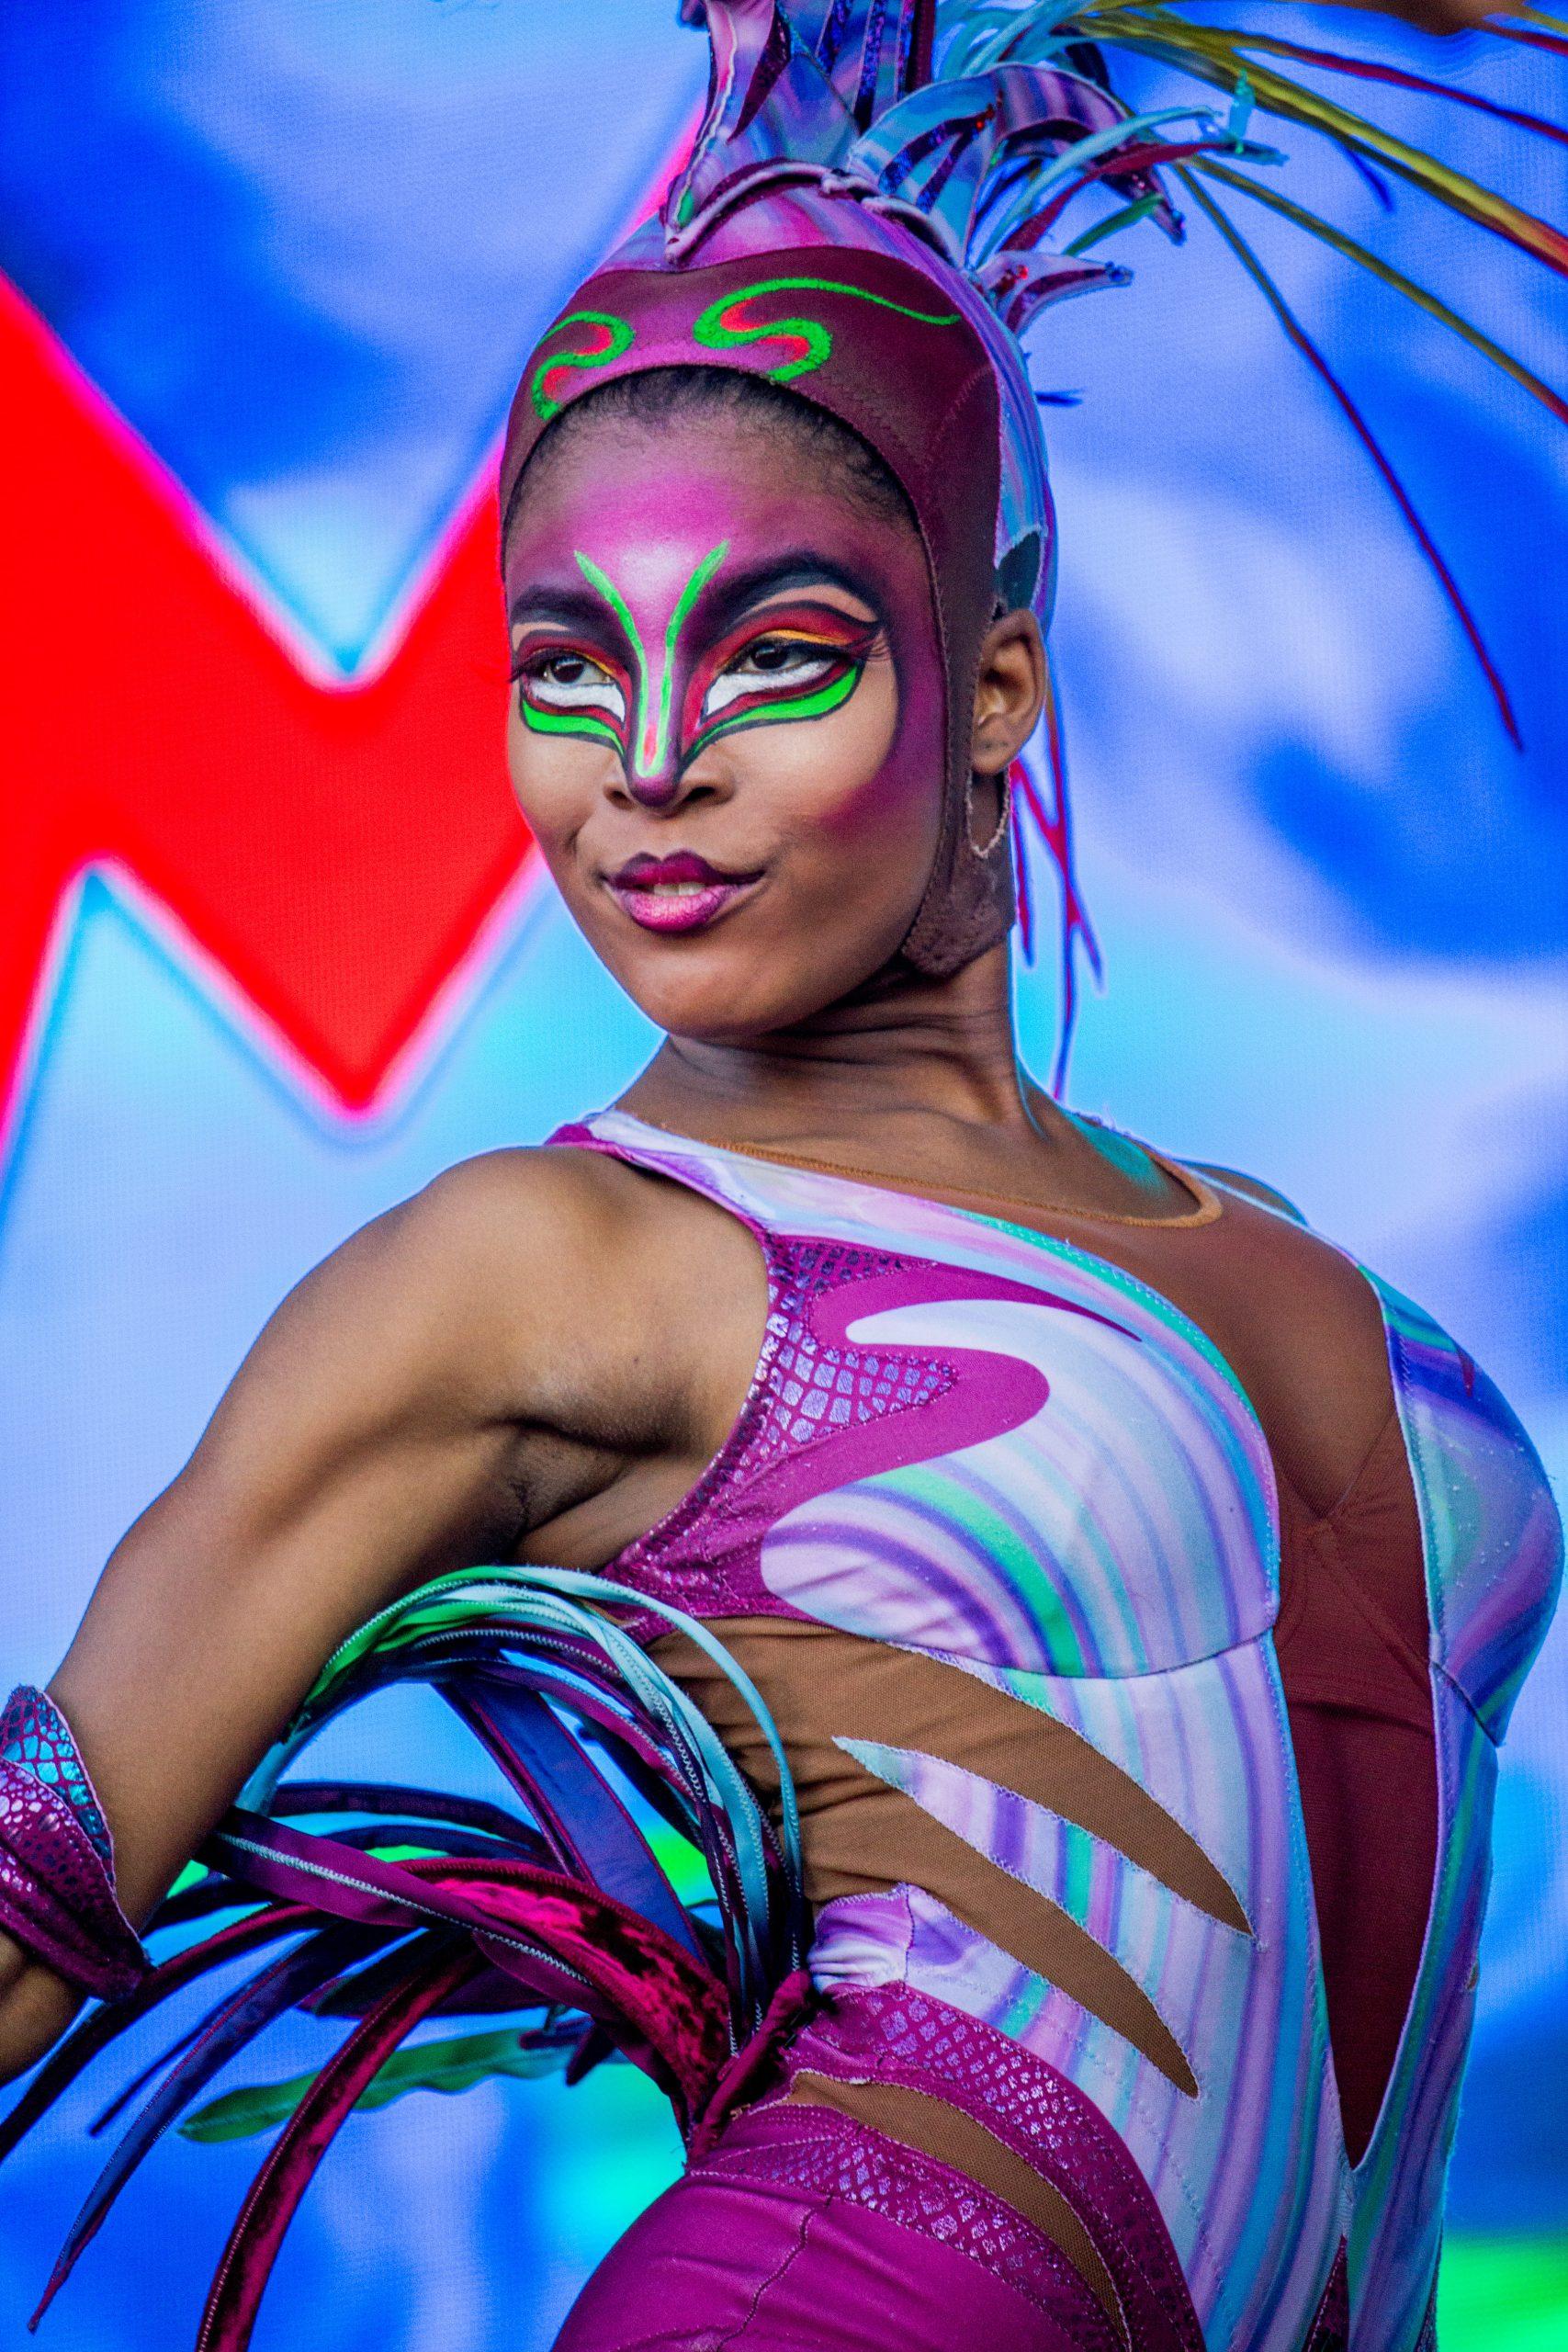 concerts-sandiego-musicfestivals-eventphotography-14